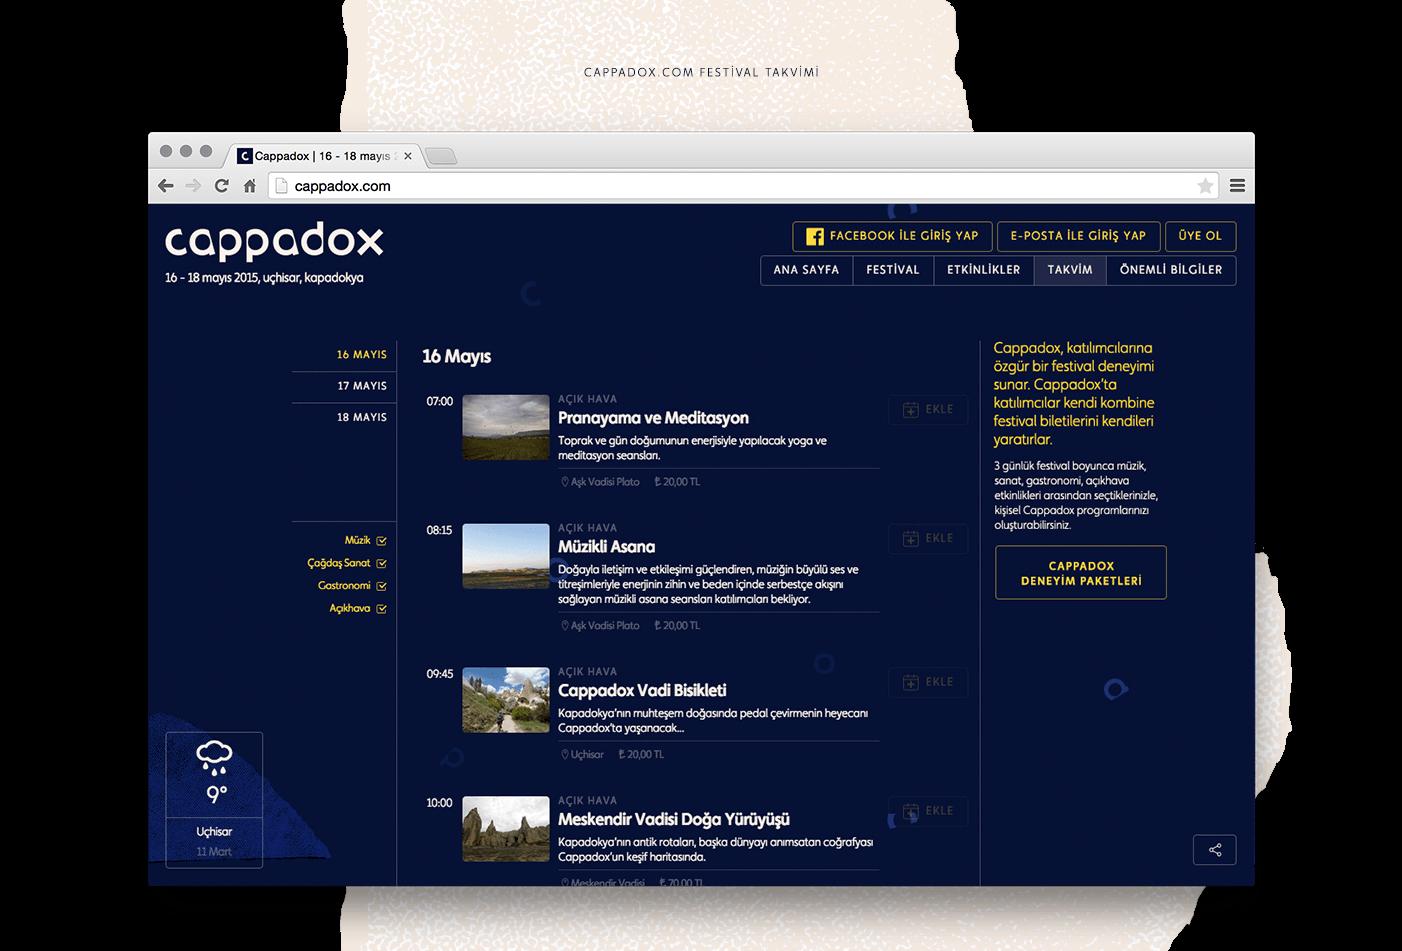 Cappadox festival takvimi